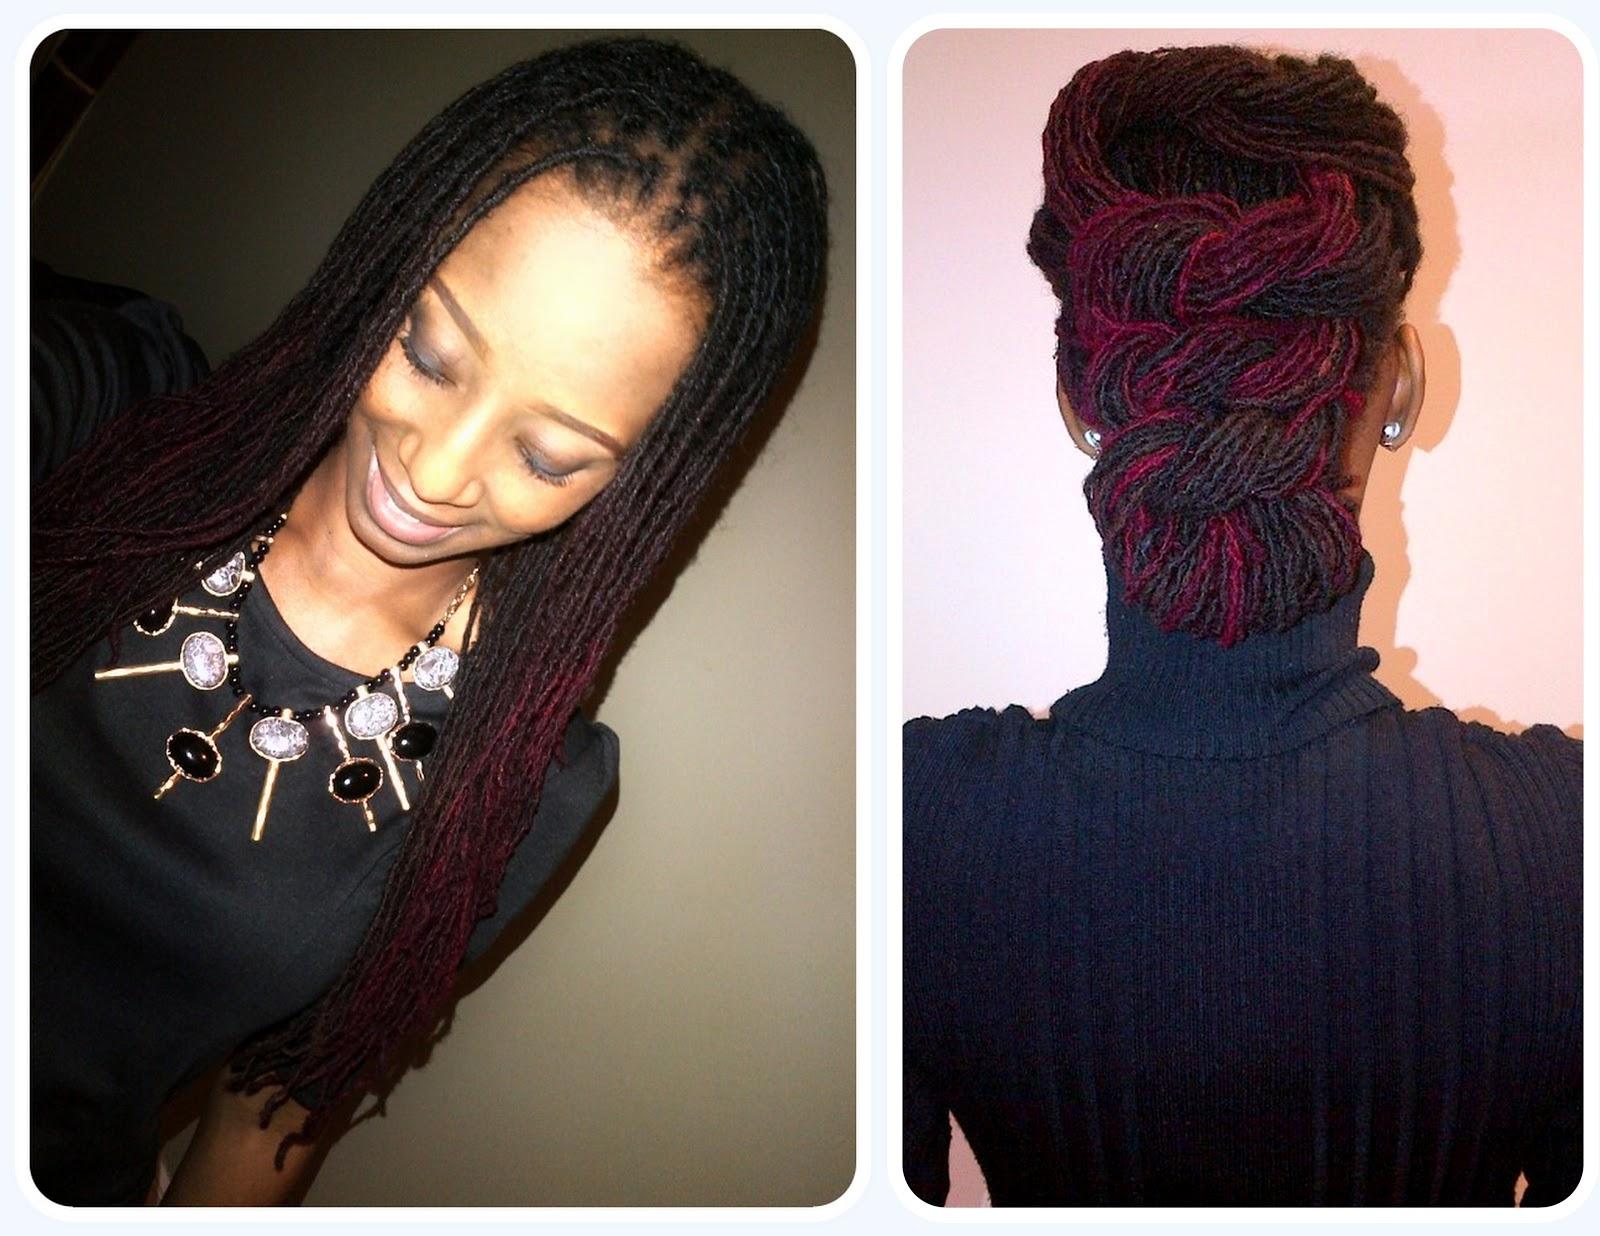 Loc n tuck hairstyle shades n styles posted in d i y hair diy loc styles my locs solutioingenieria Gallery